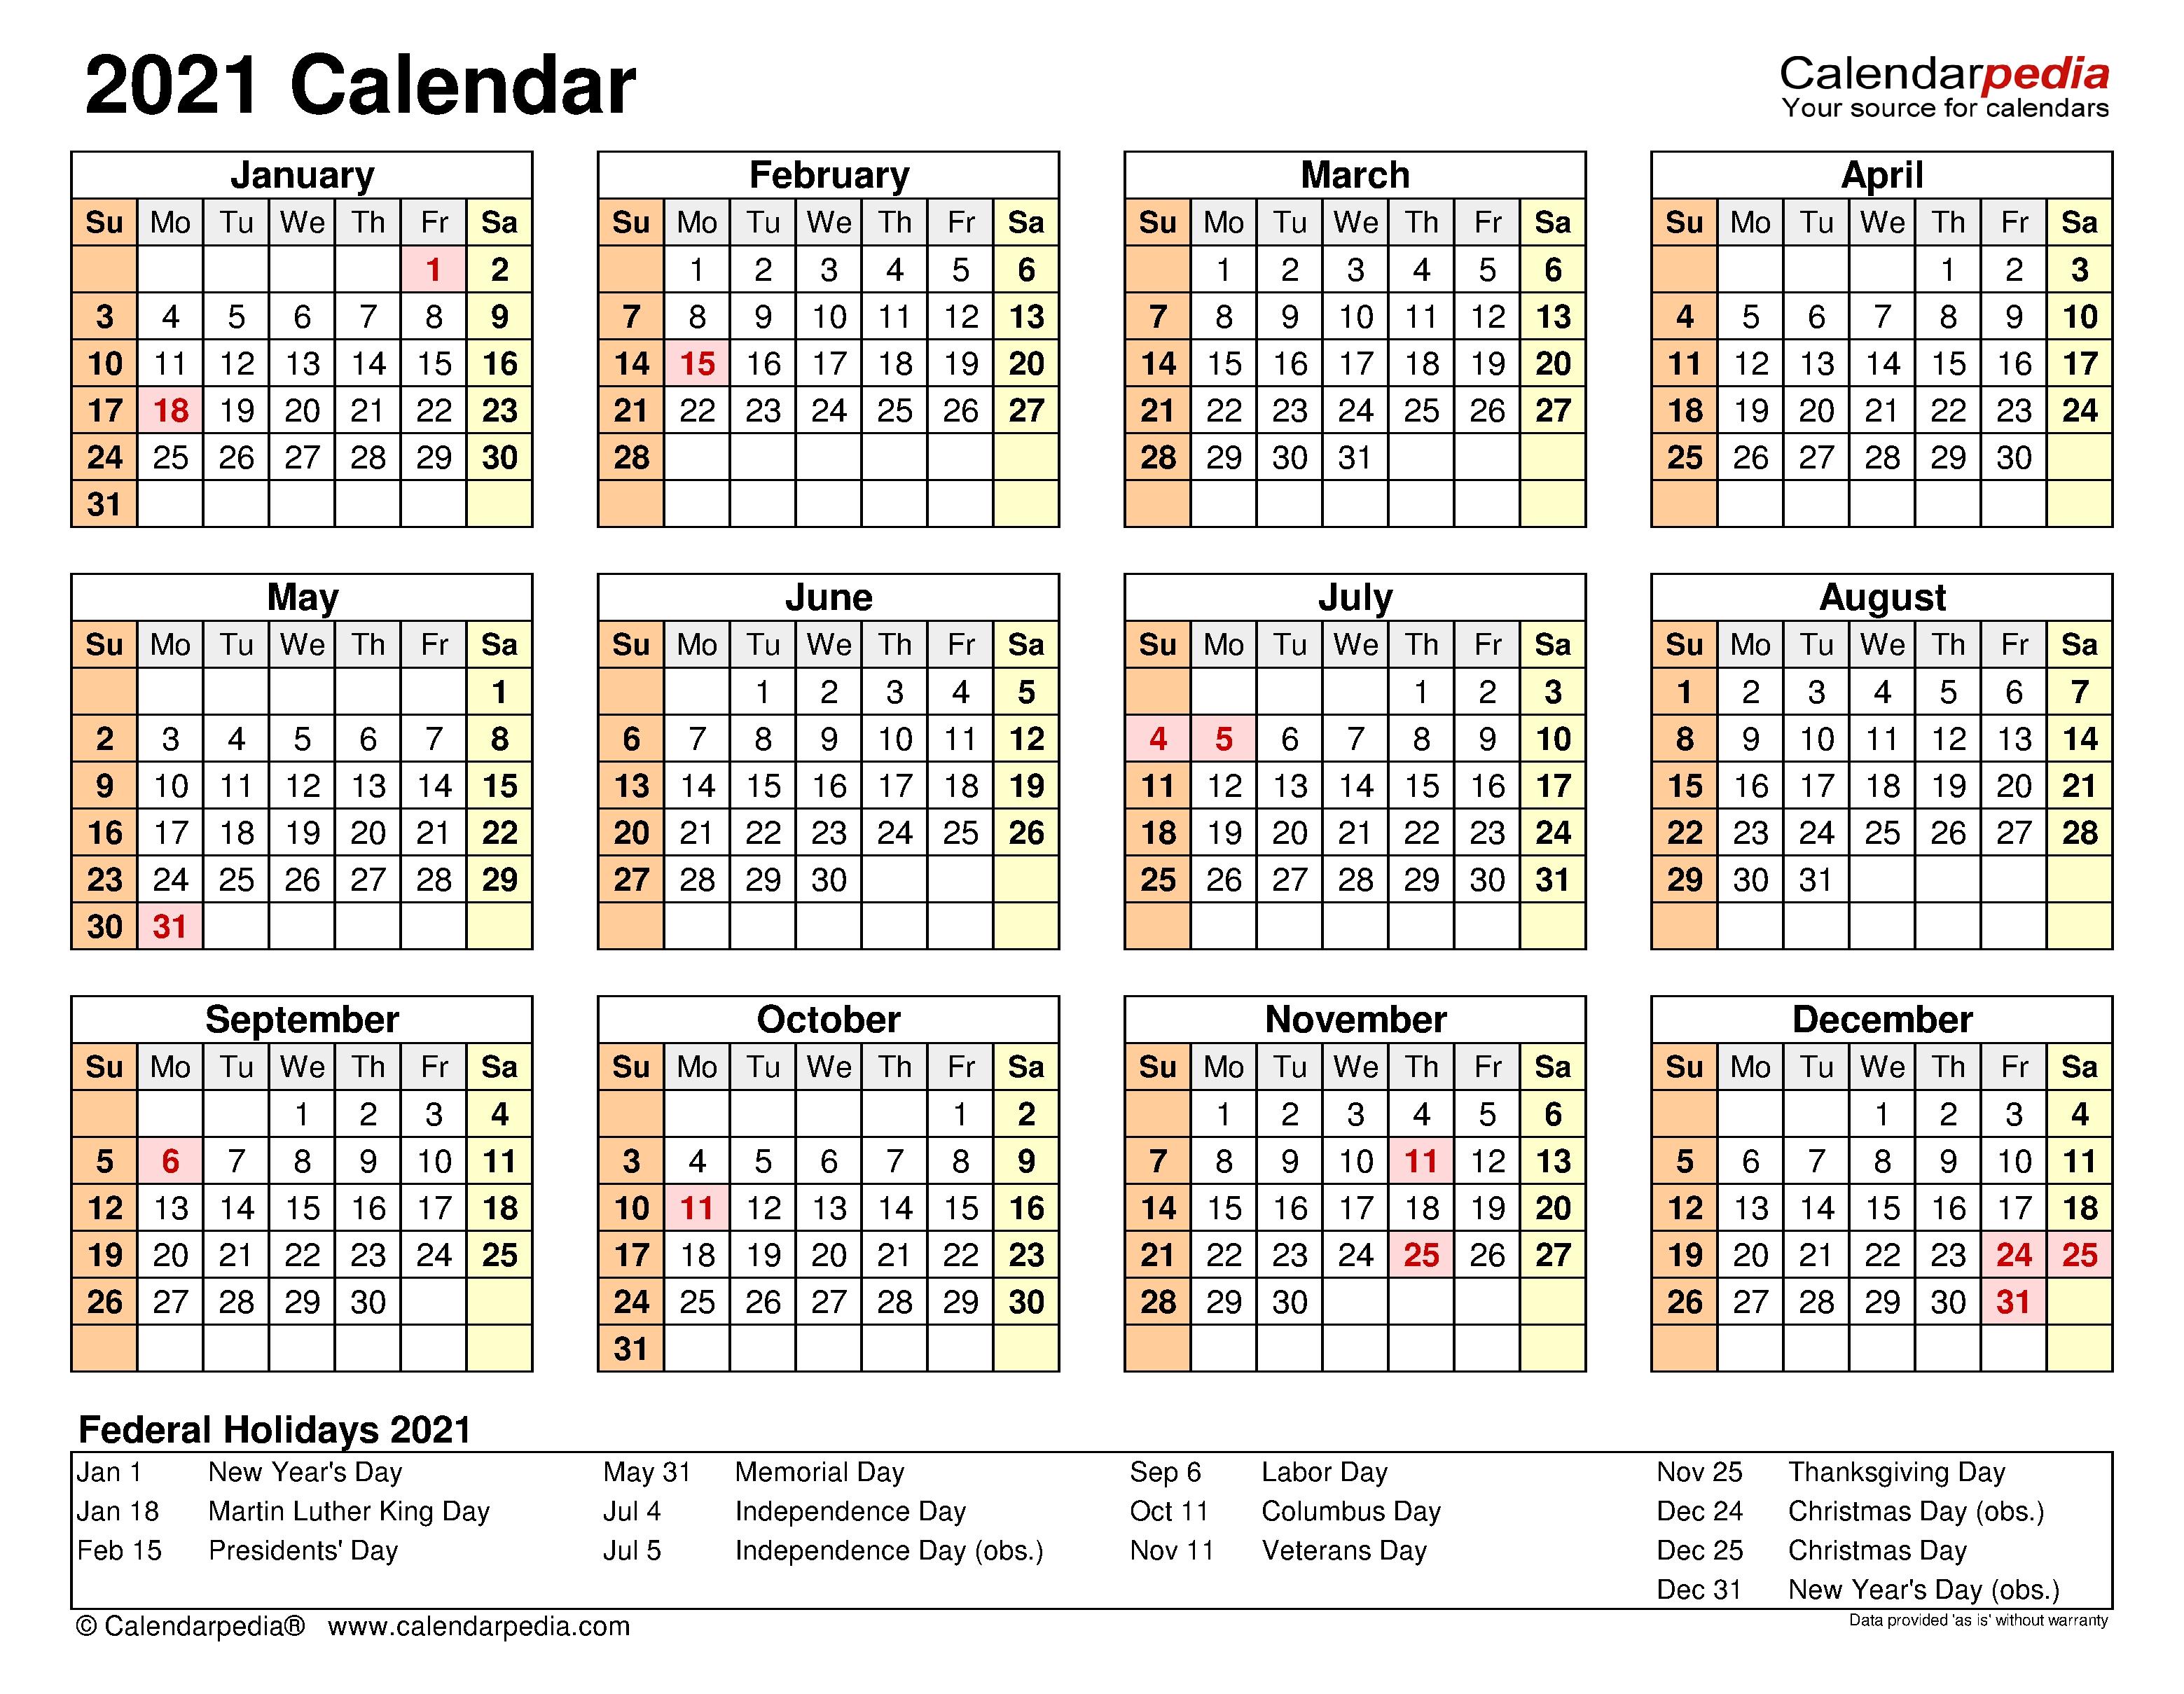 2021 Calendar - Free Printable Excel Templates - Calendarpedia 2021 Lined Calendar Printable Excel